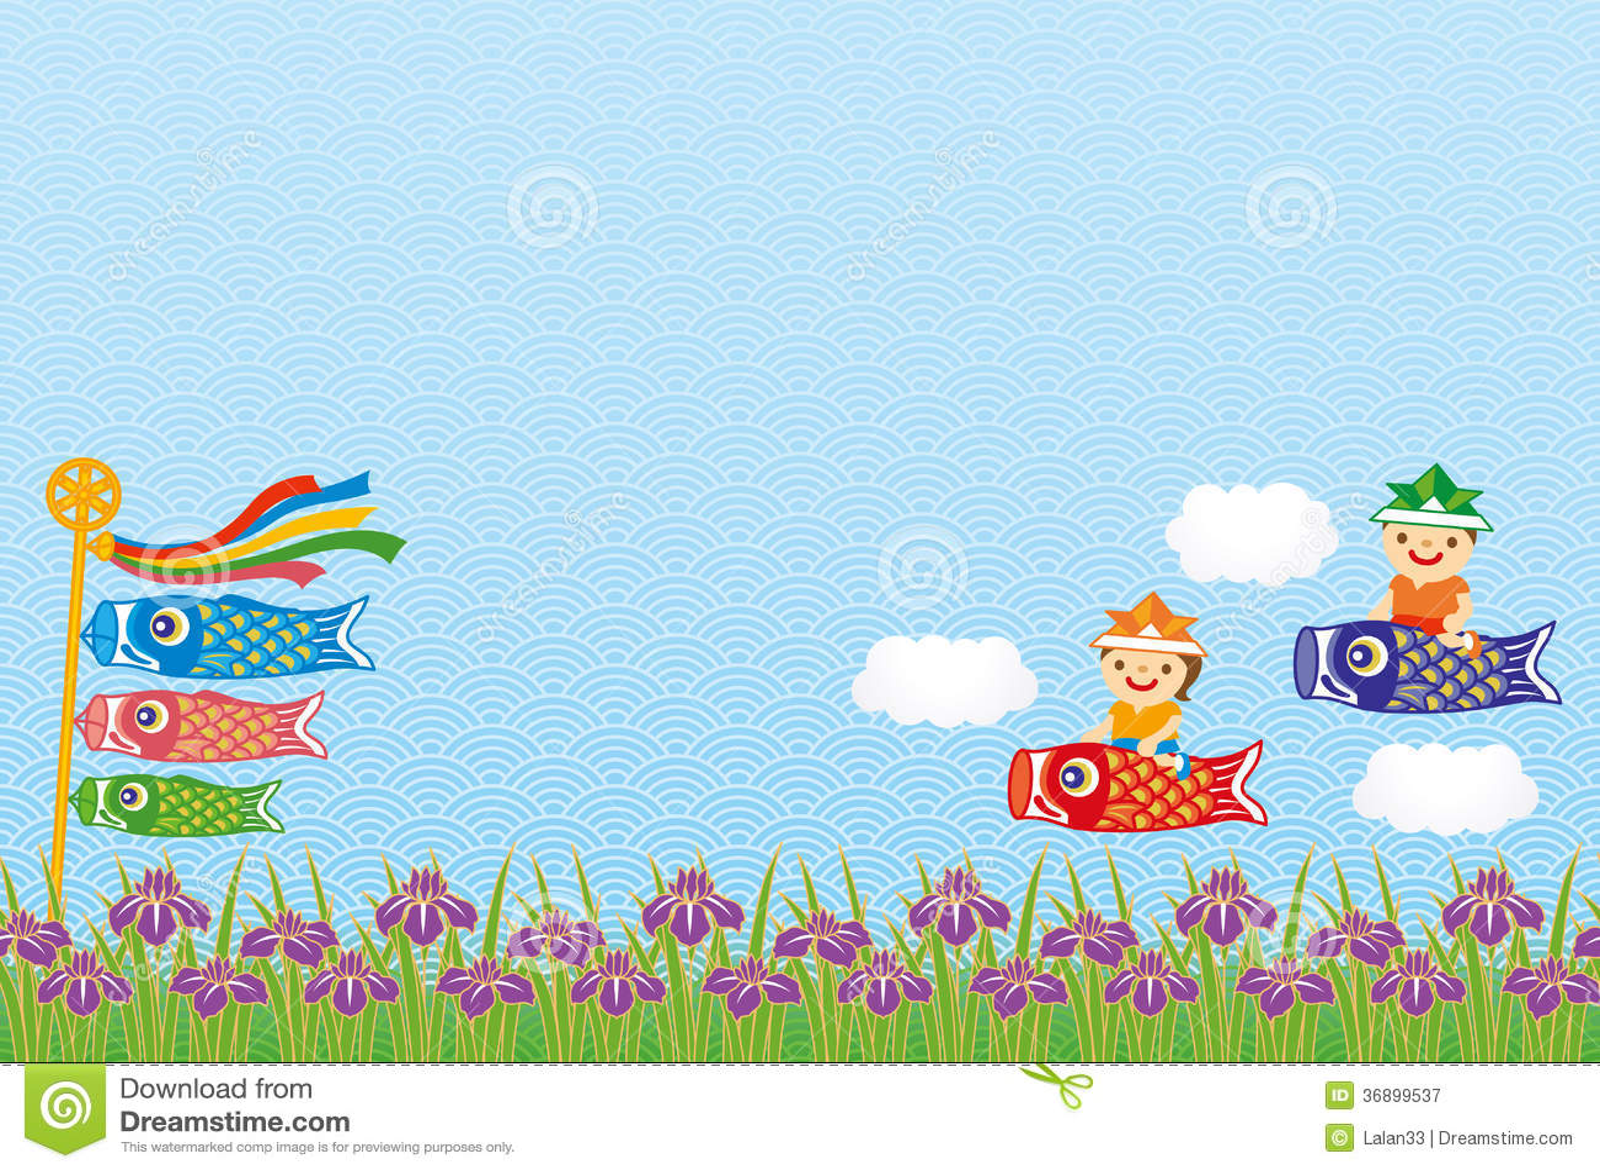 Kodomo-no-hi (Children's Day) Background. Royalty Free